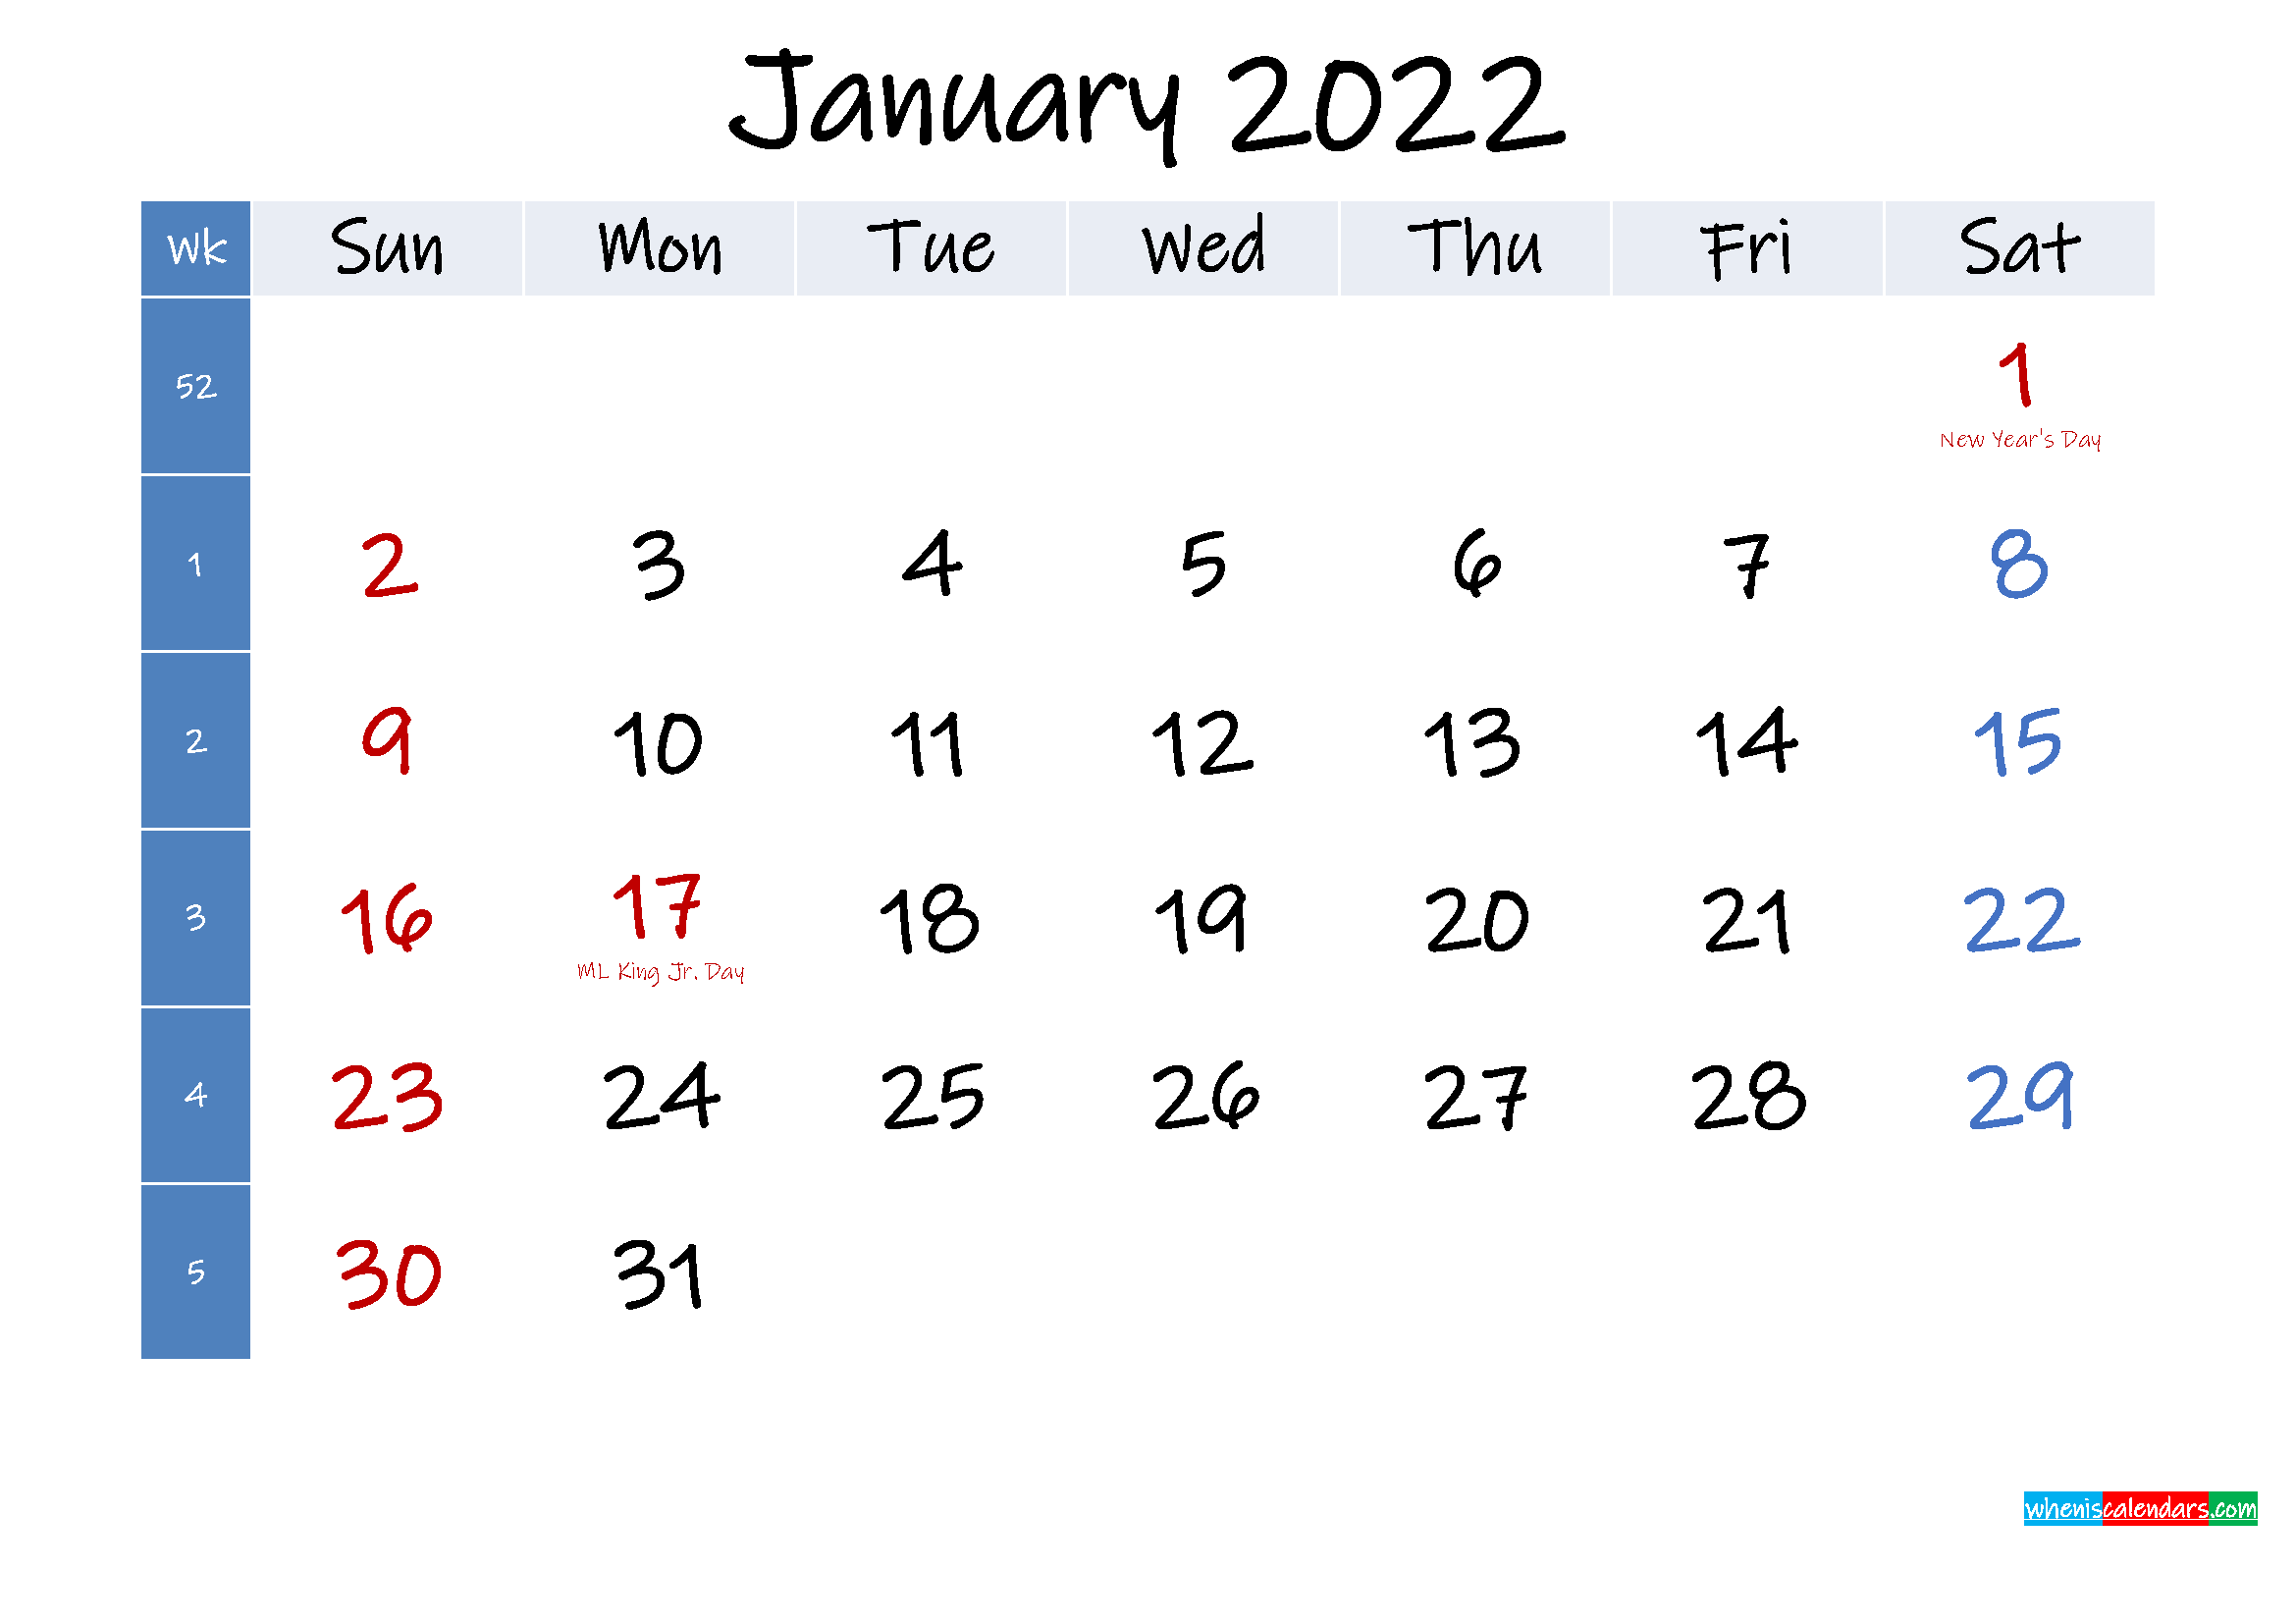 January 2022 Free Printable Calendar With Holidays With Regard To January Printable Calendar 2022